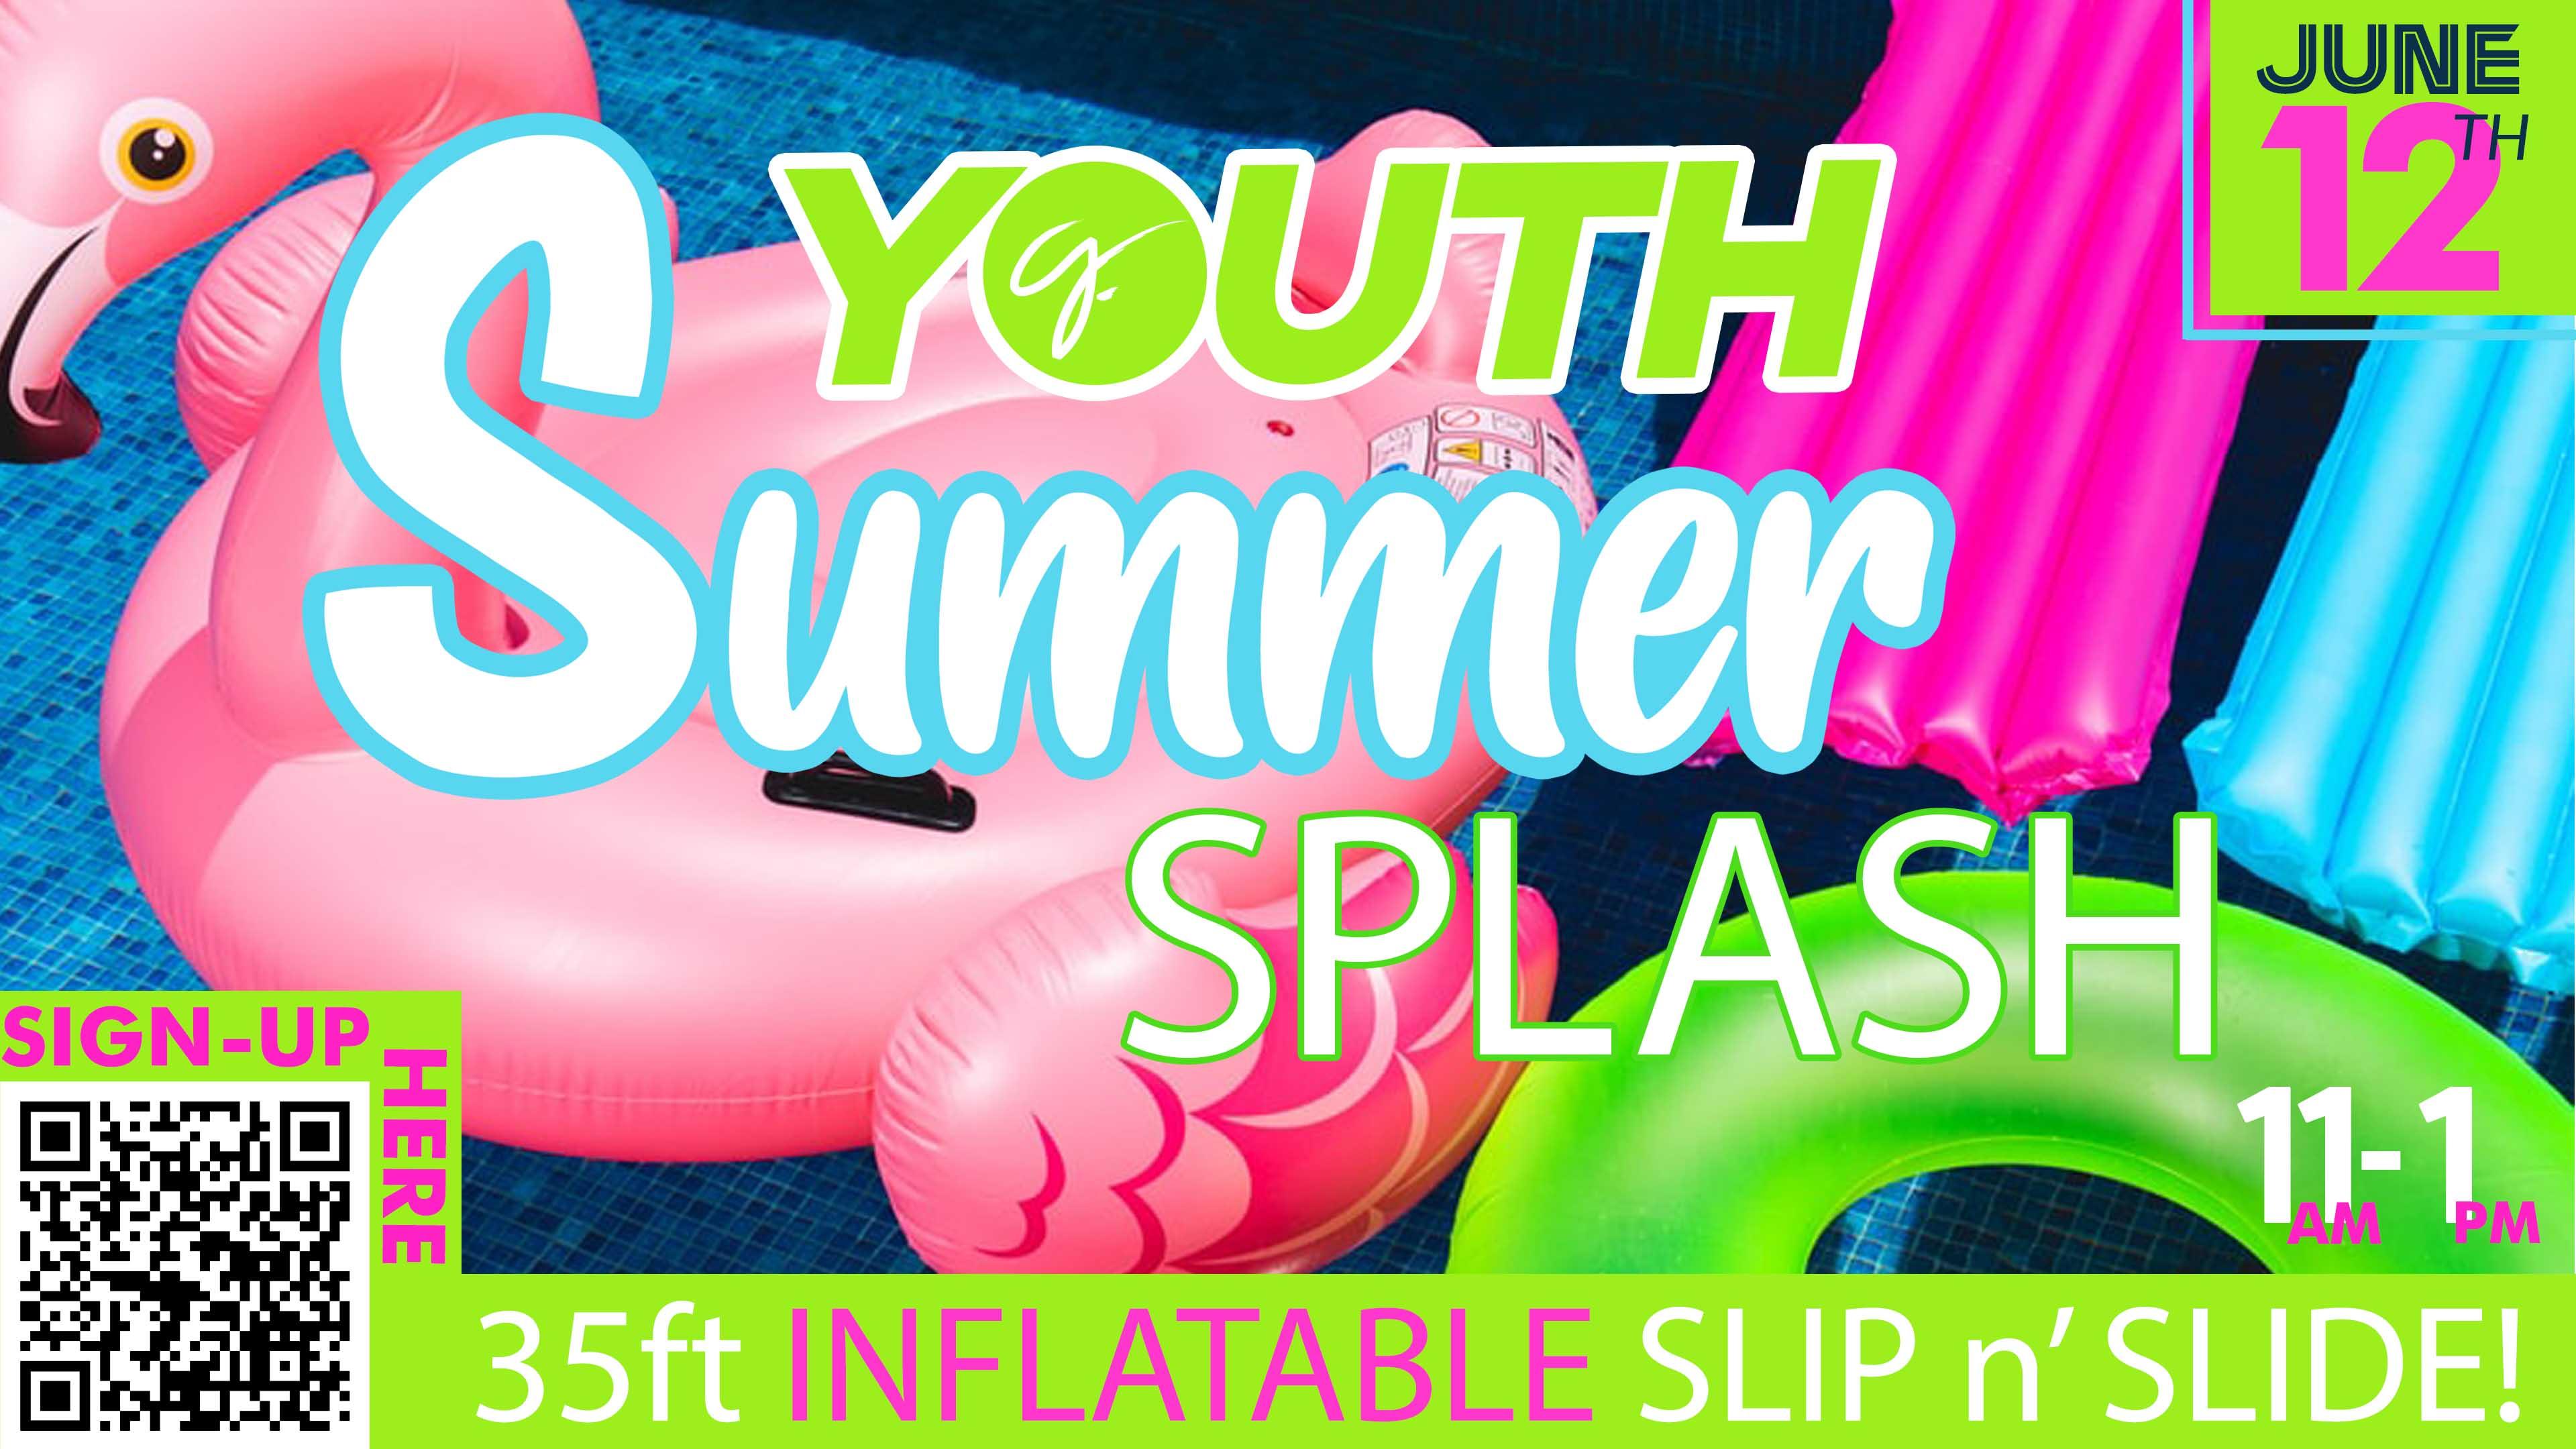 YOUTH Summer Splash